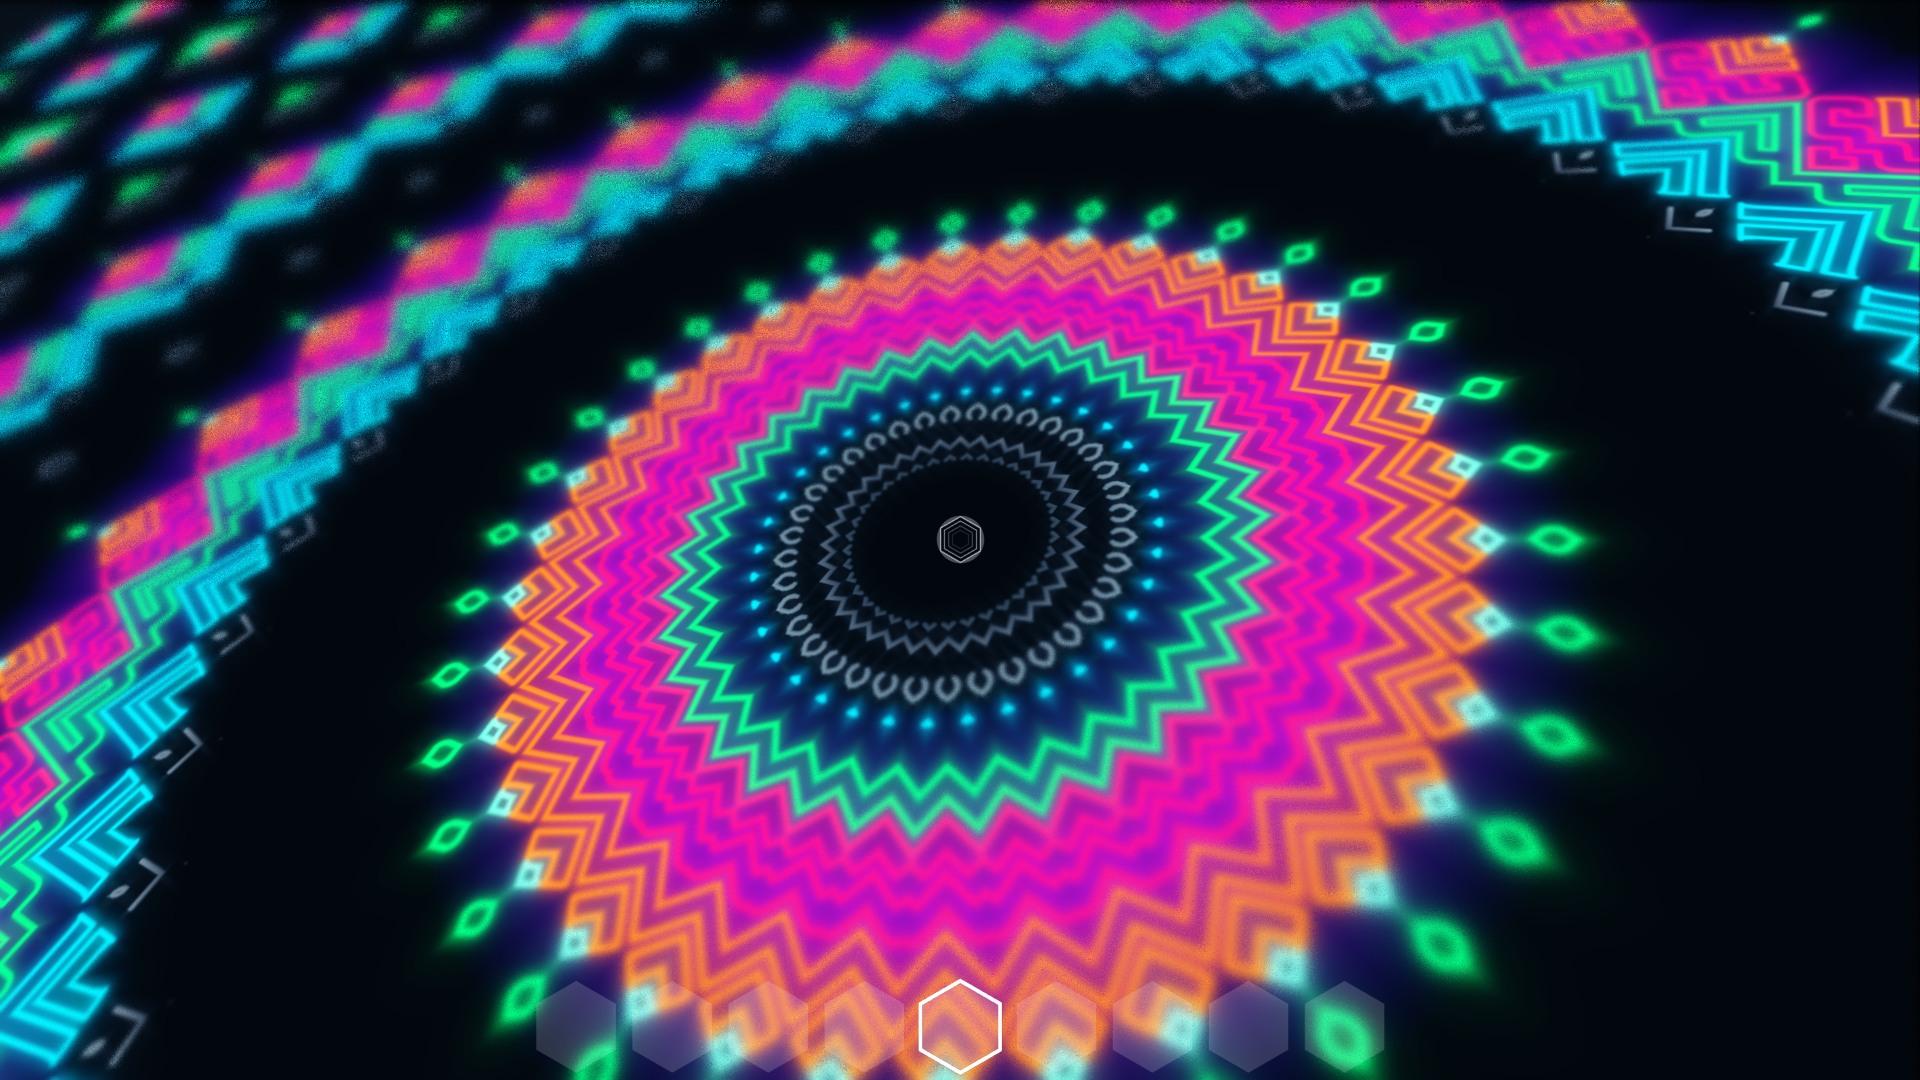 Acid Trip Backgrounds 1920x1080